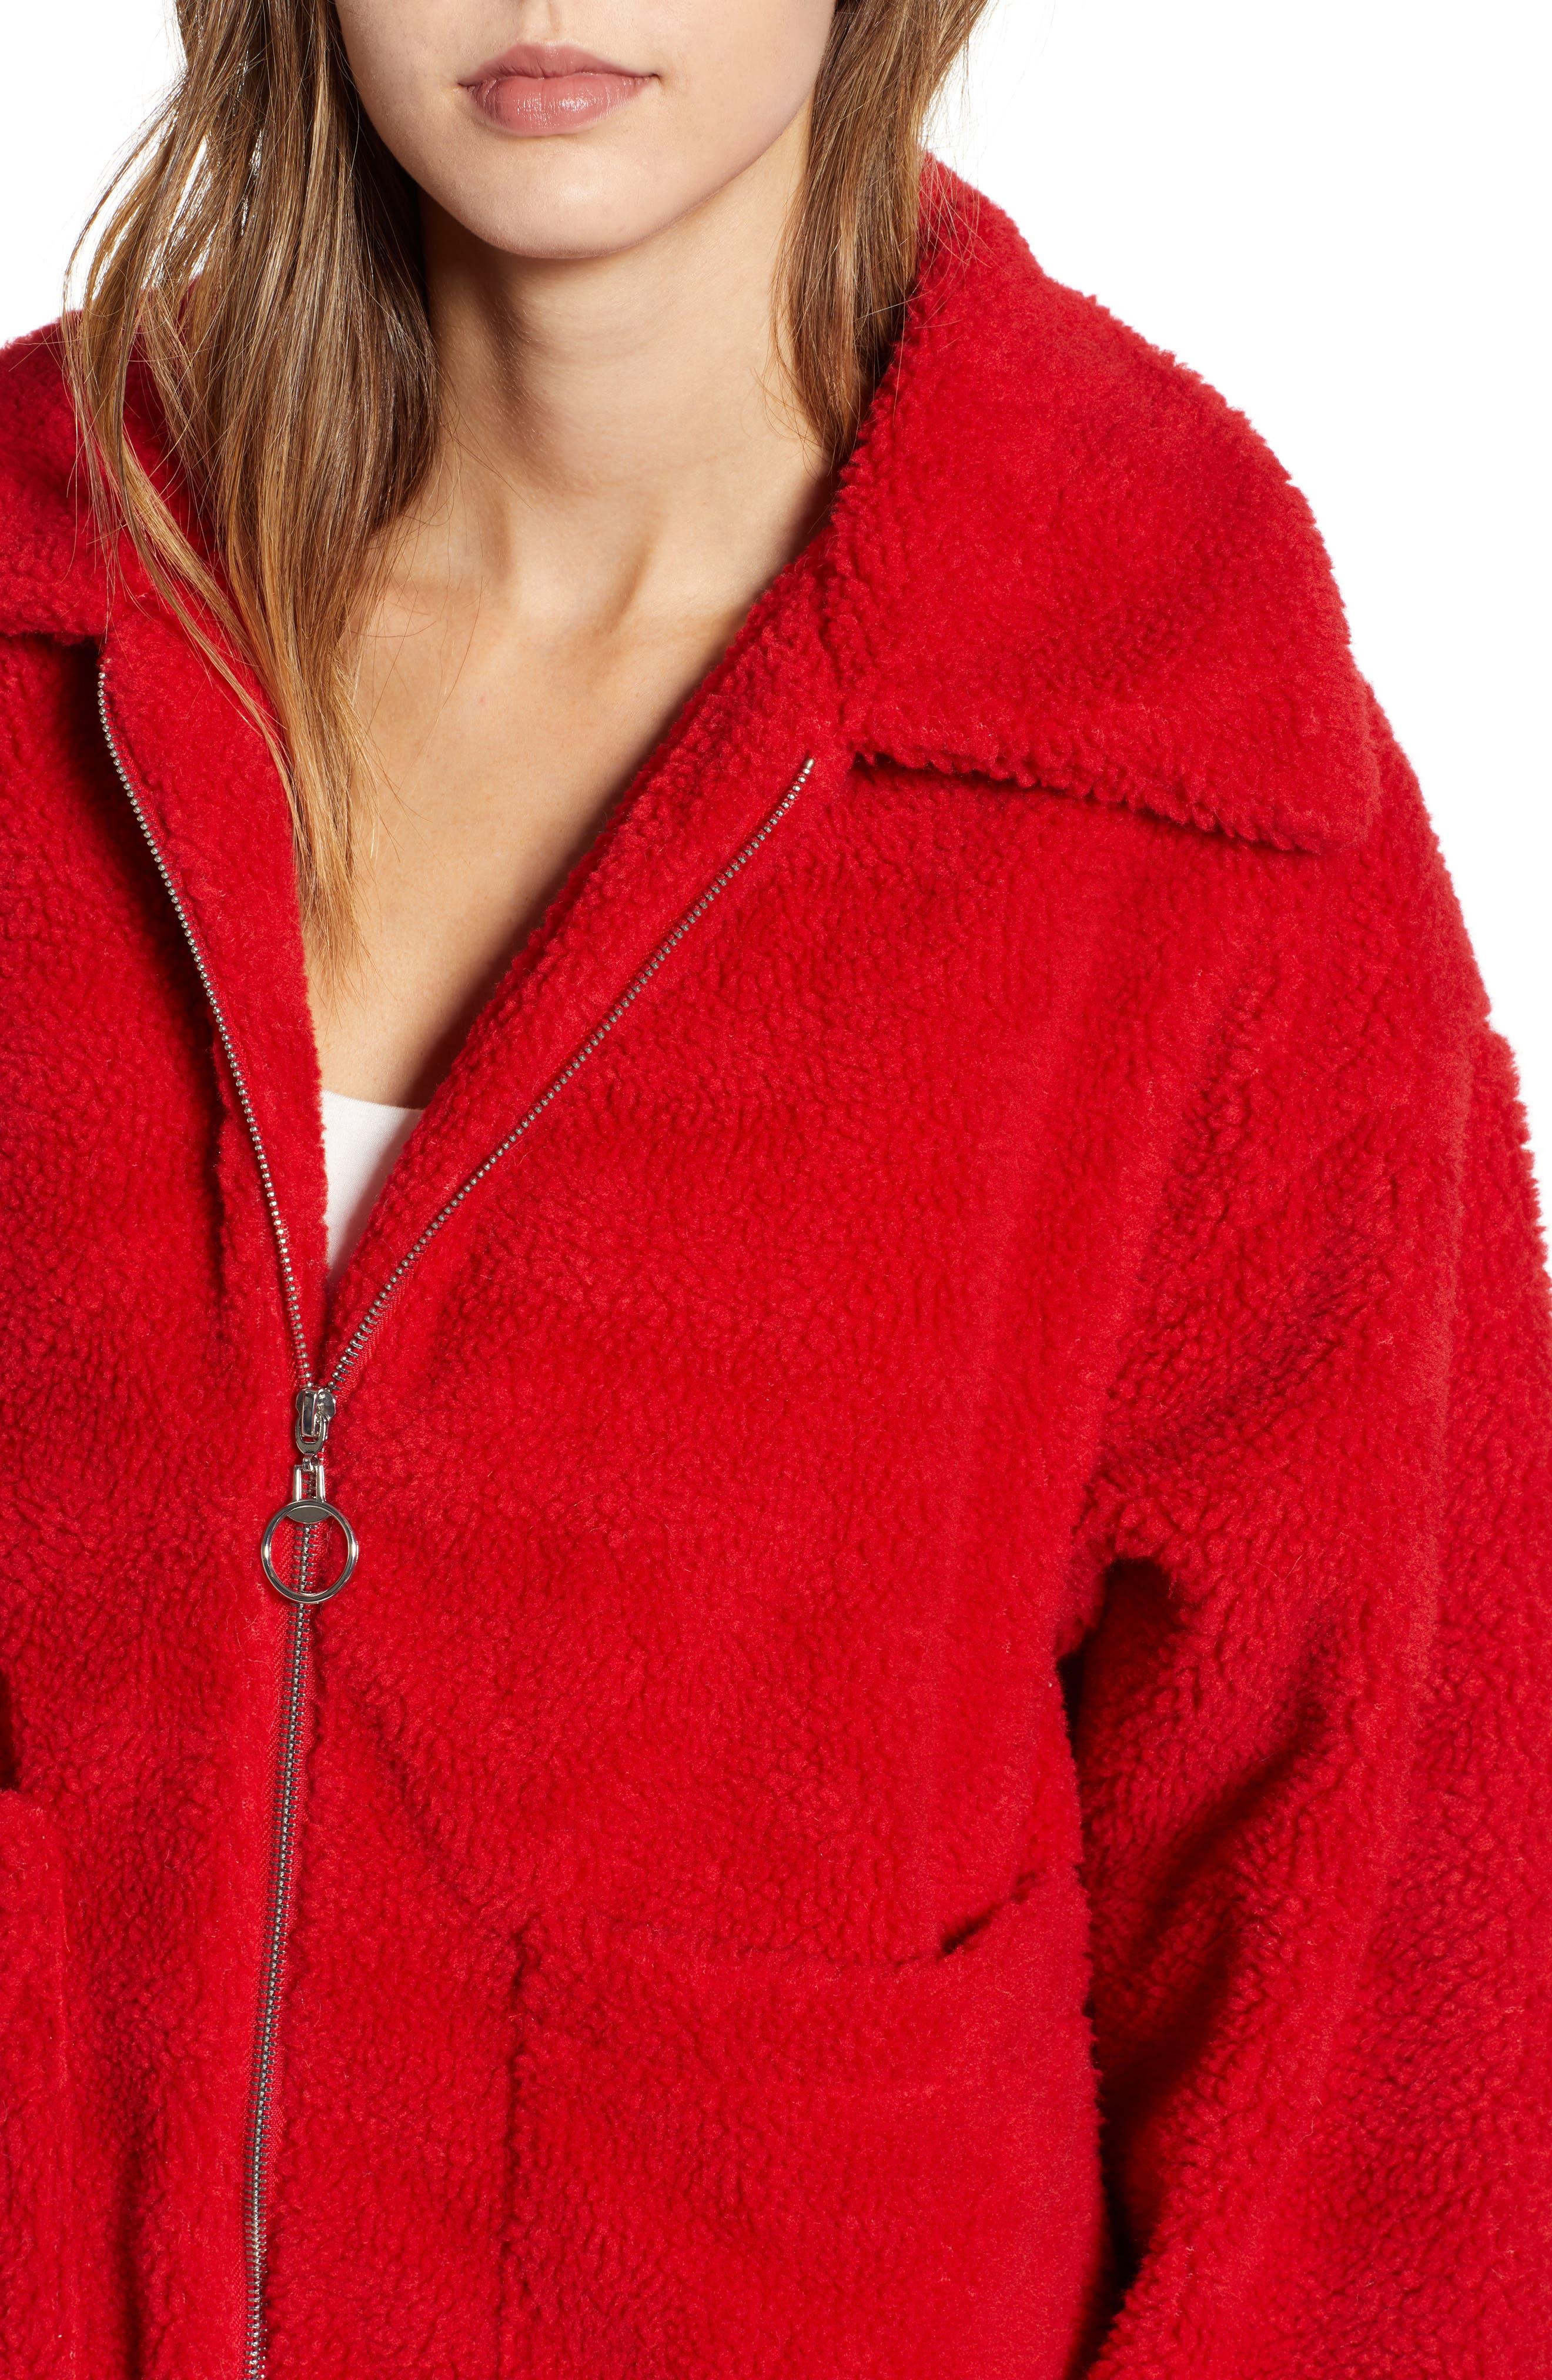 Oversized Fleece Jacket,                             Alternate thumbnail 4, color,                             RED